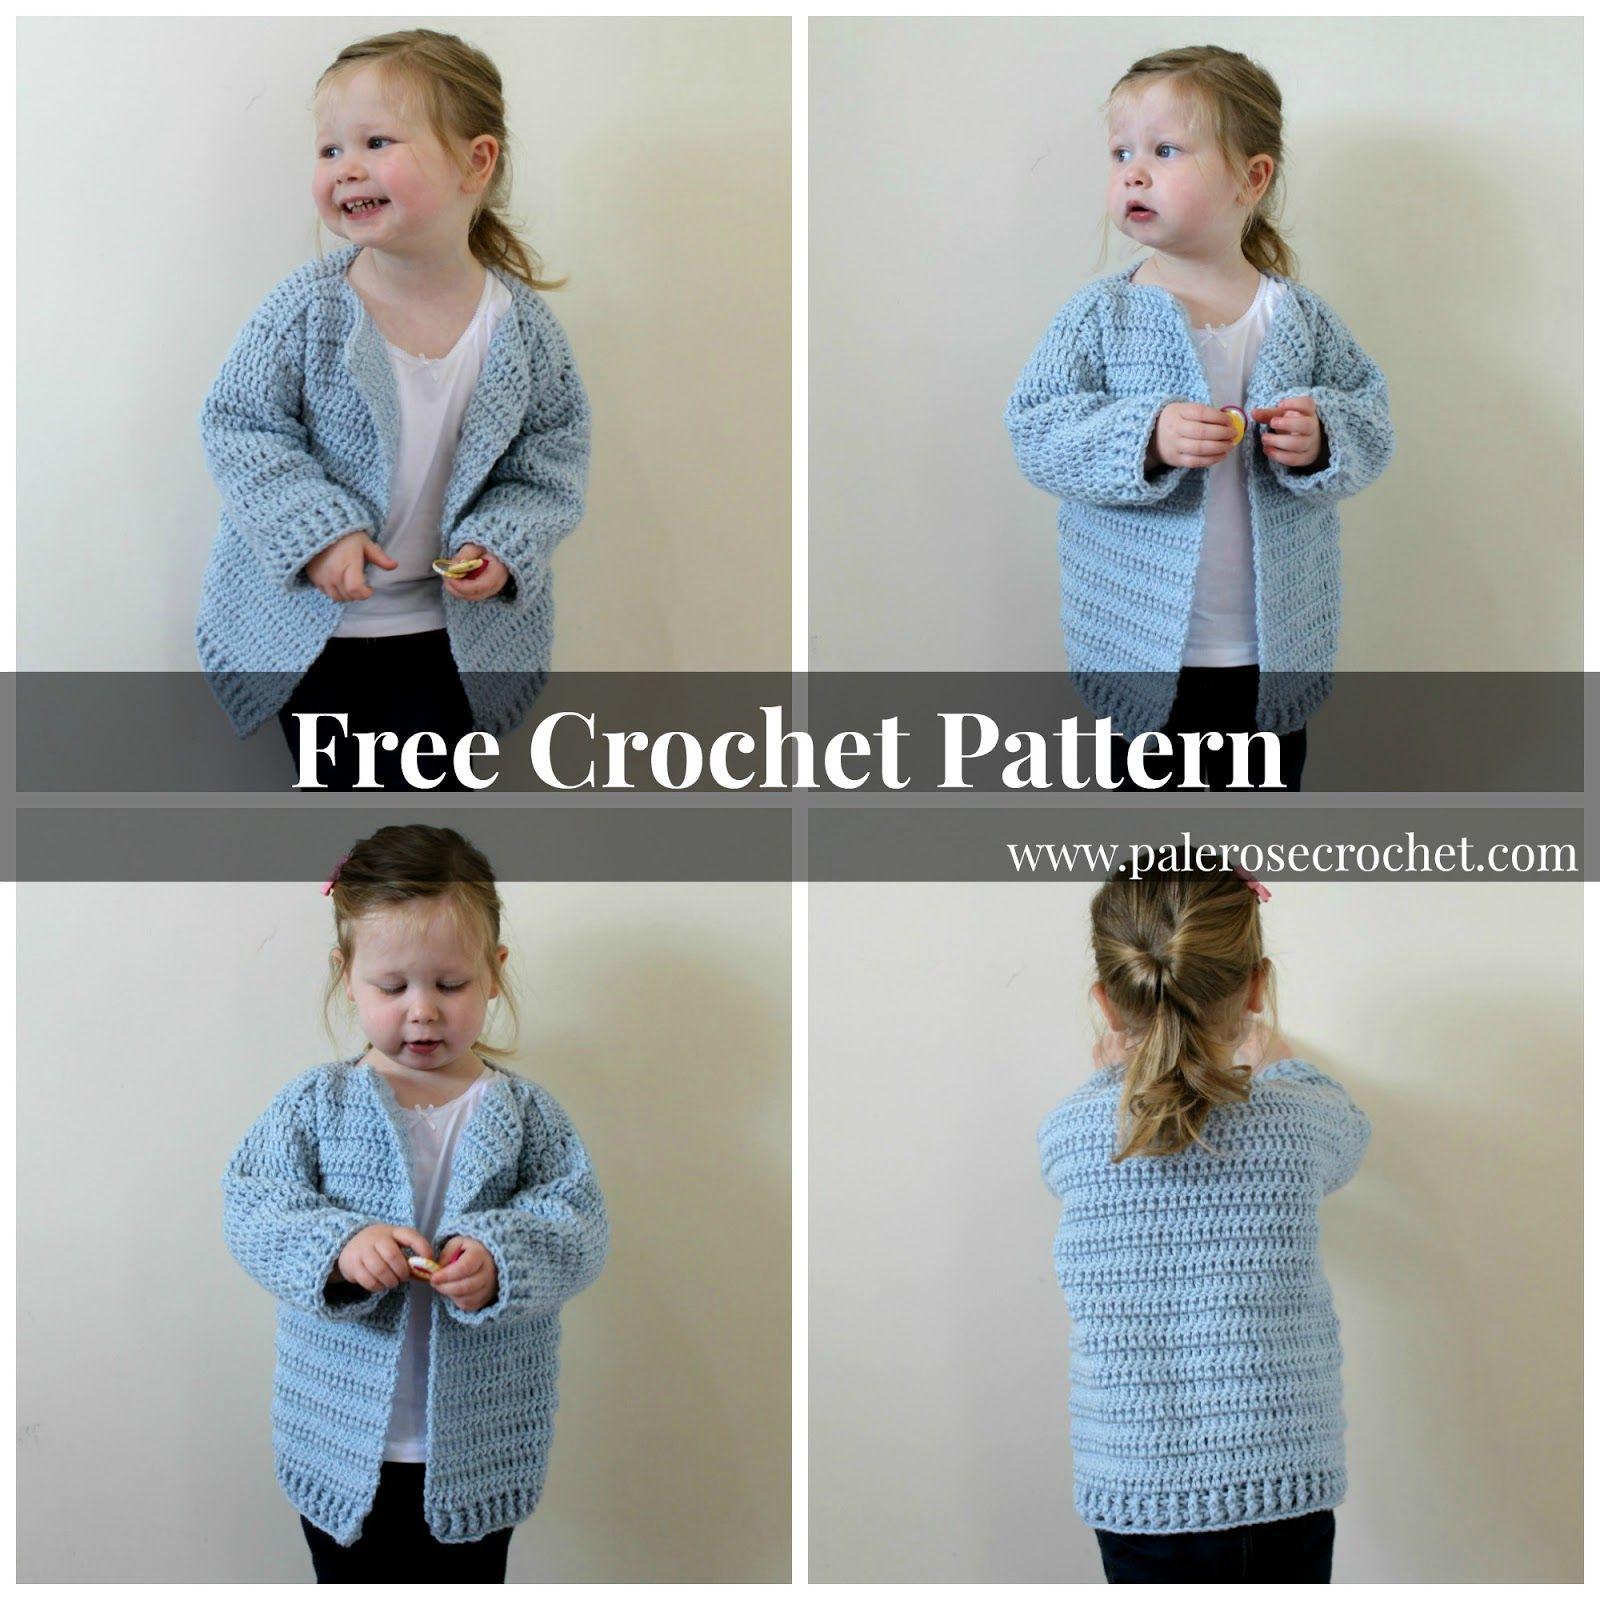 Oversized Toddler Cardigan Pattern | Pale Rose Crochet | Crochet and ...